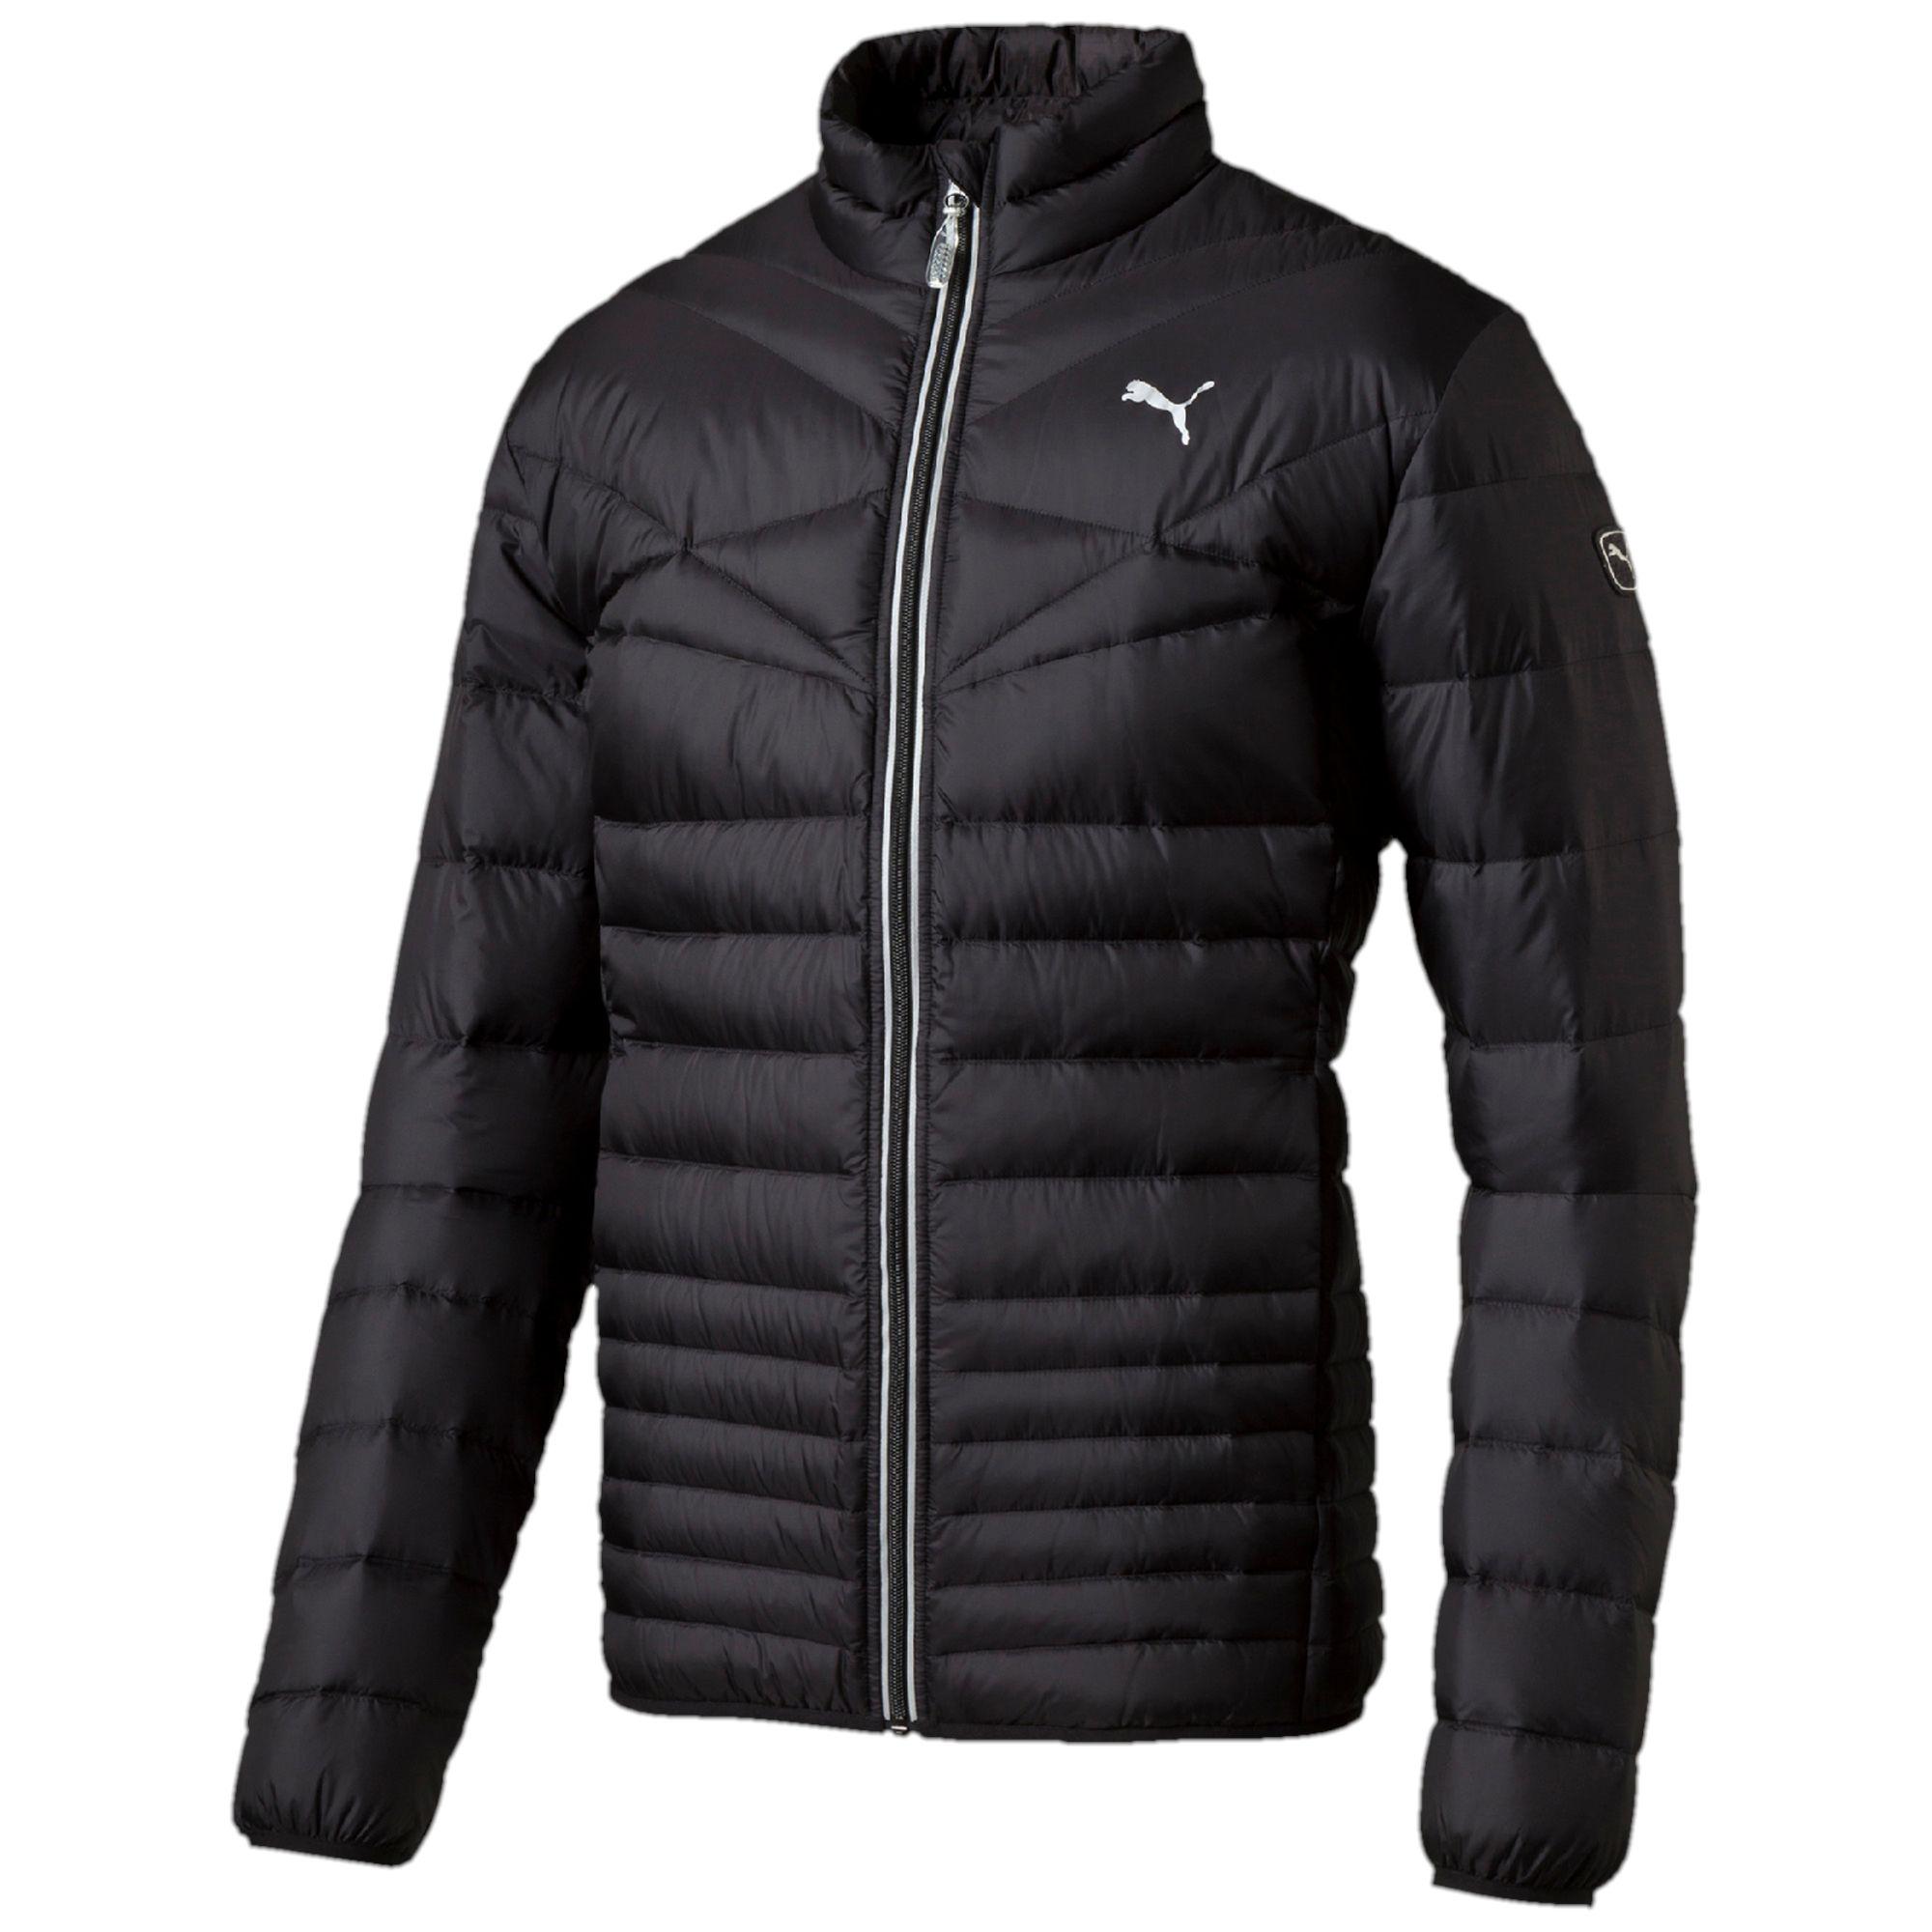 PUMA Herren Jacke ACTIVE 600 PackLITE Down Jacket, Black